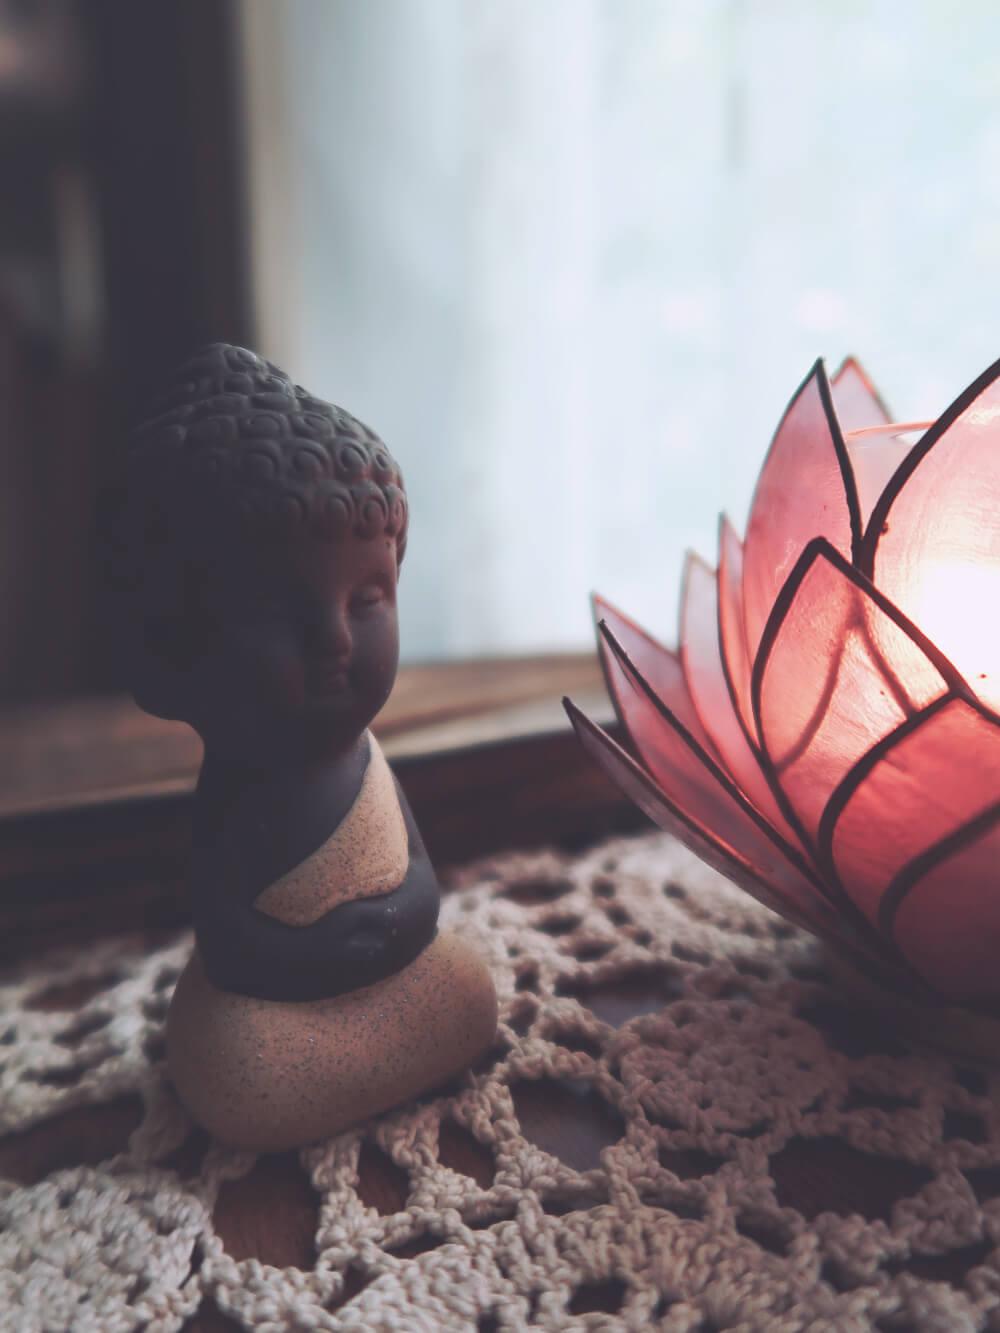 Serenity Buddha figurine